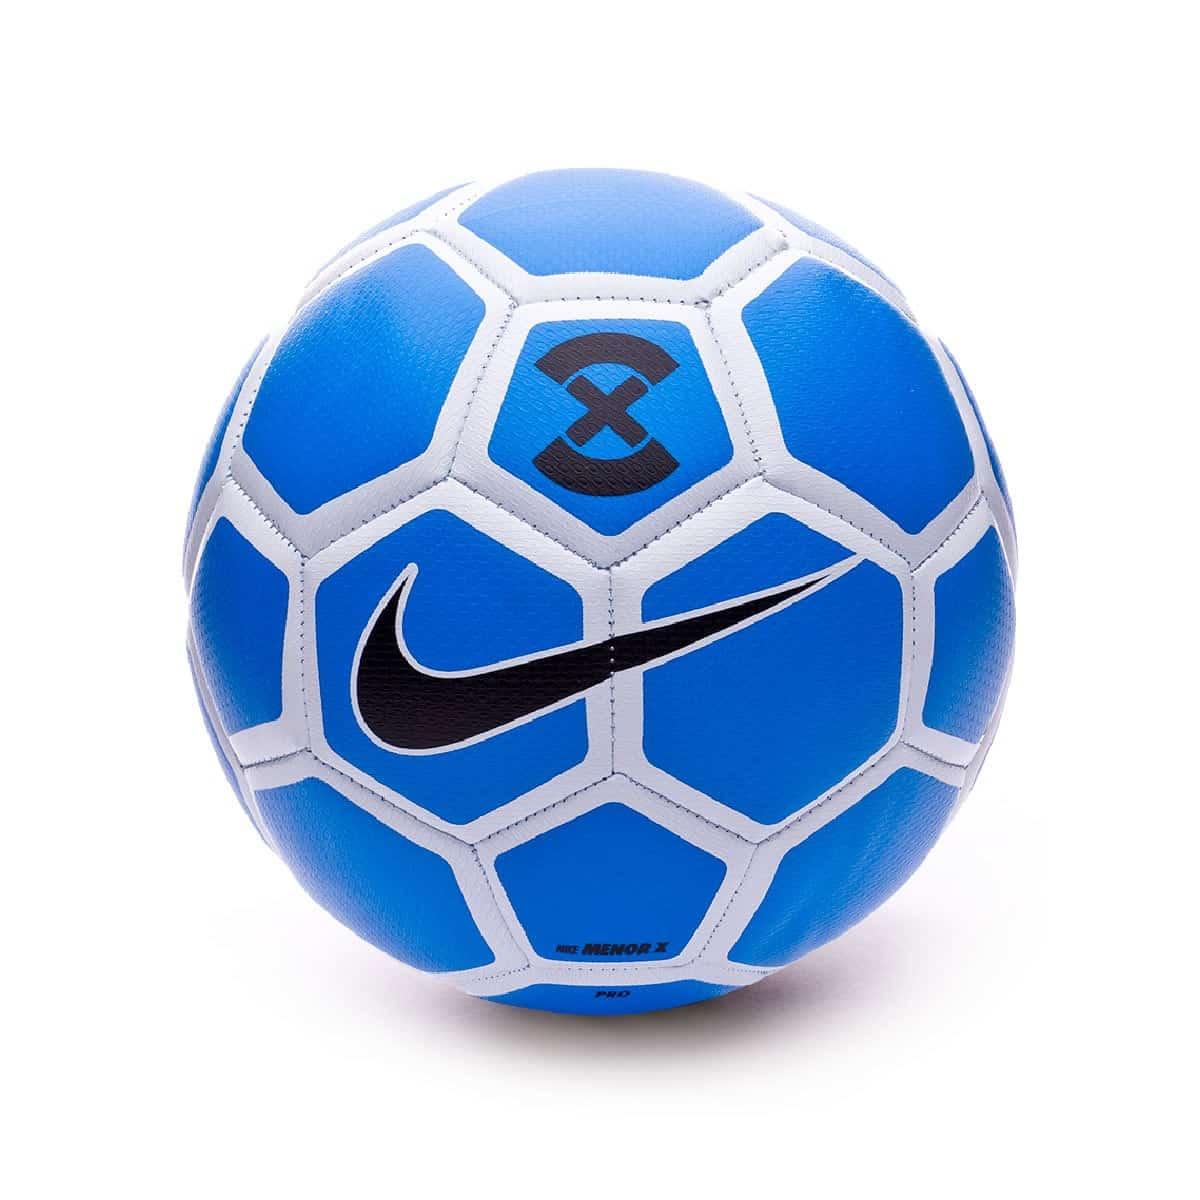 Nike-Original-Rolinho-Menor-X-Biru-Putih-New-2018